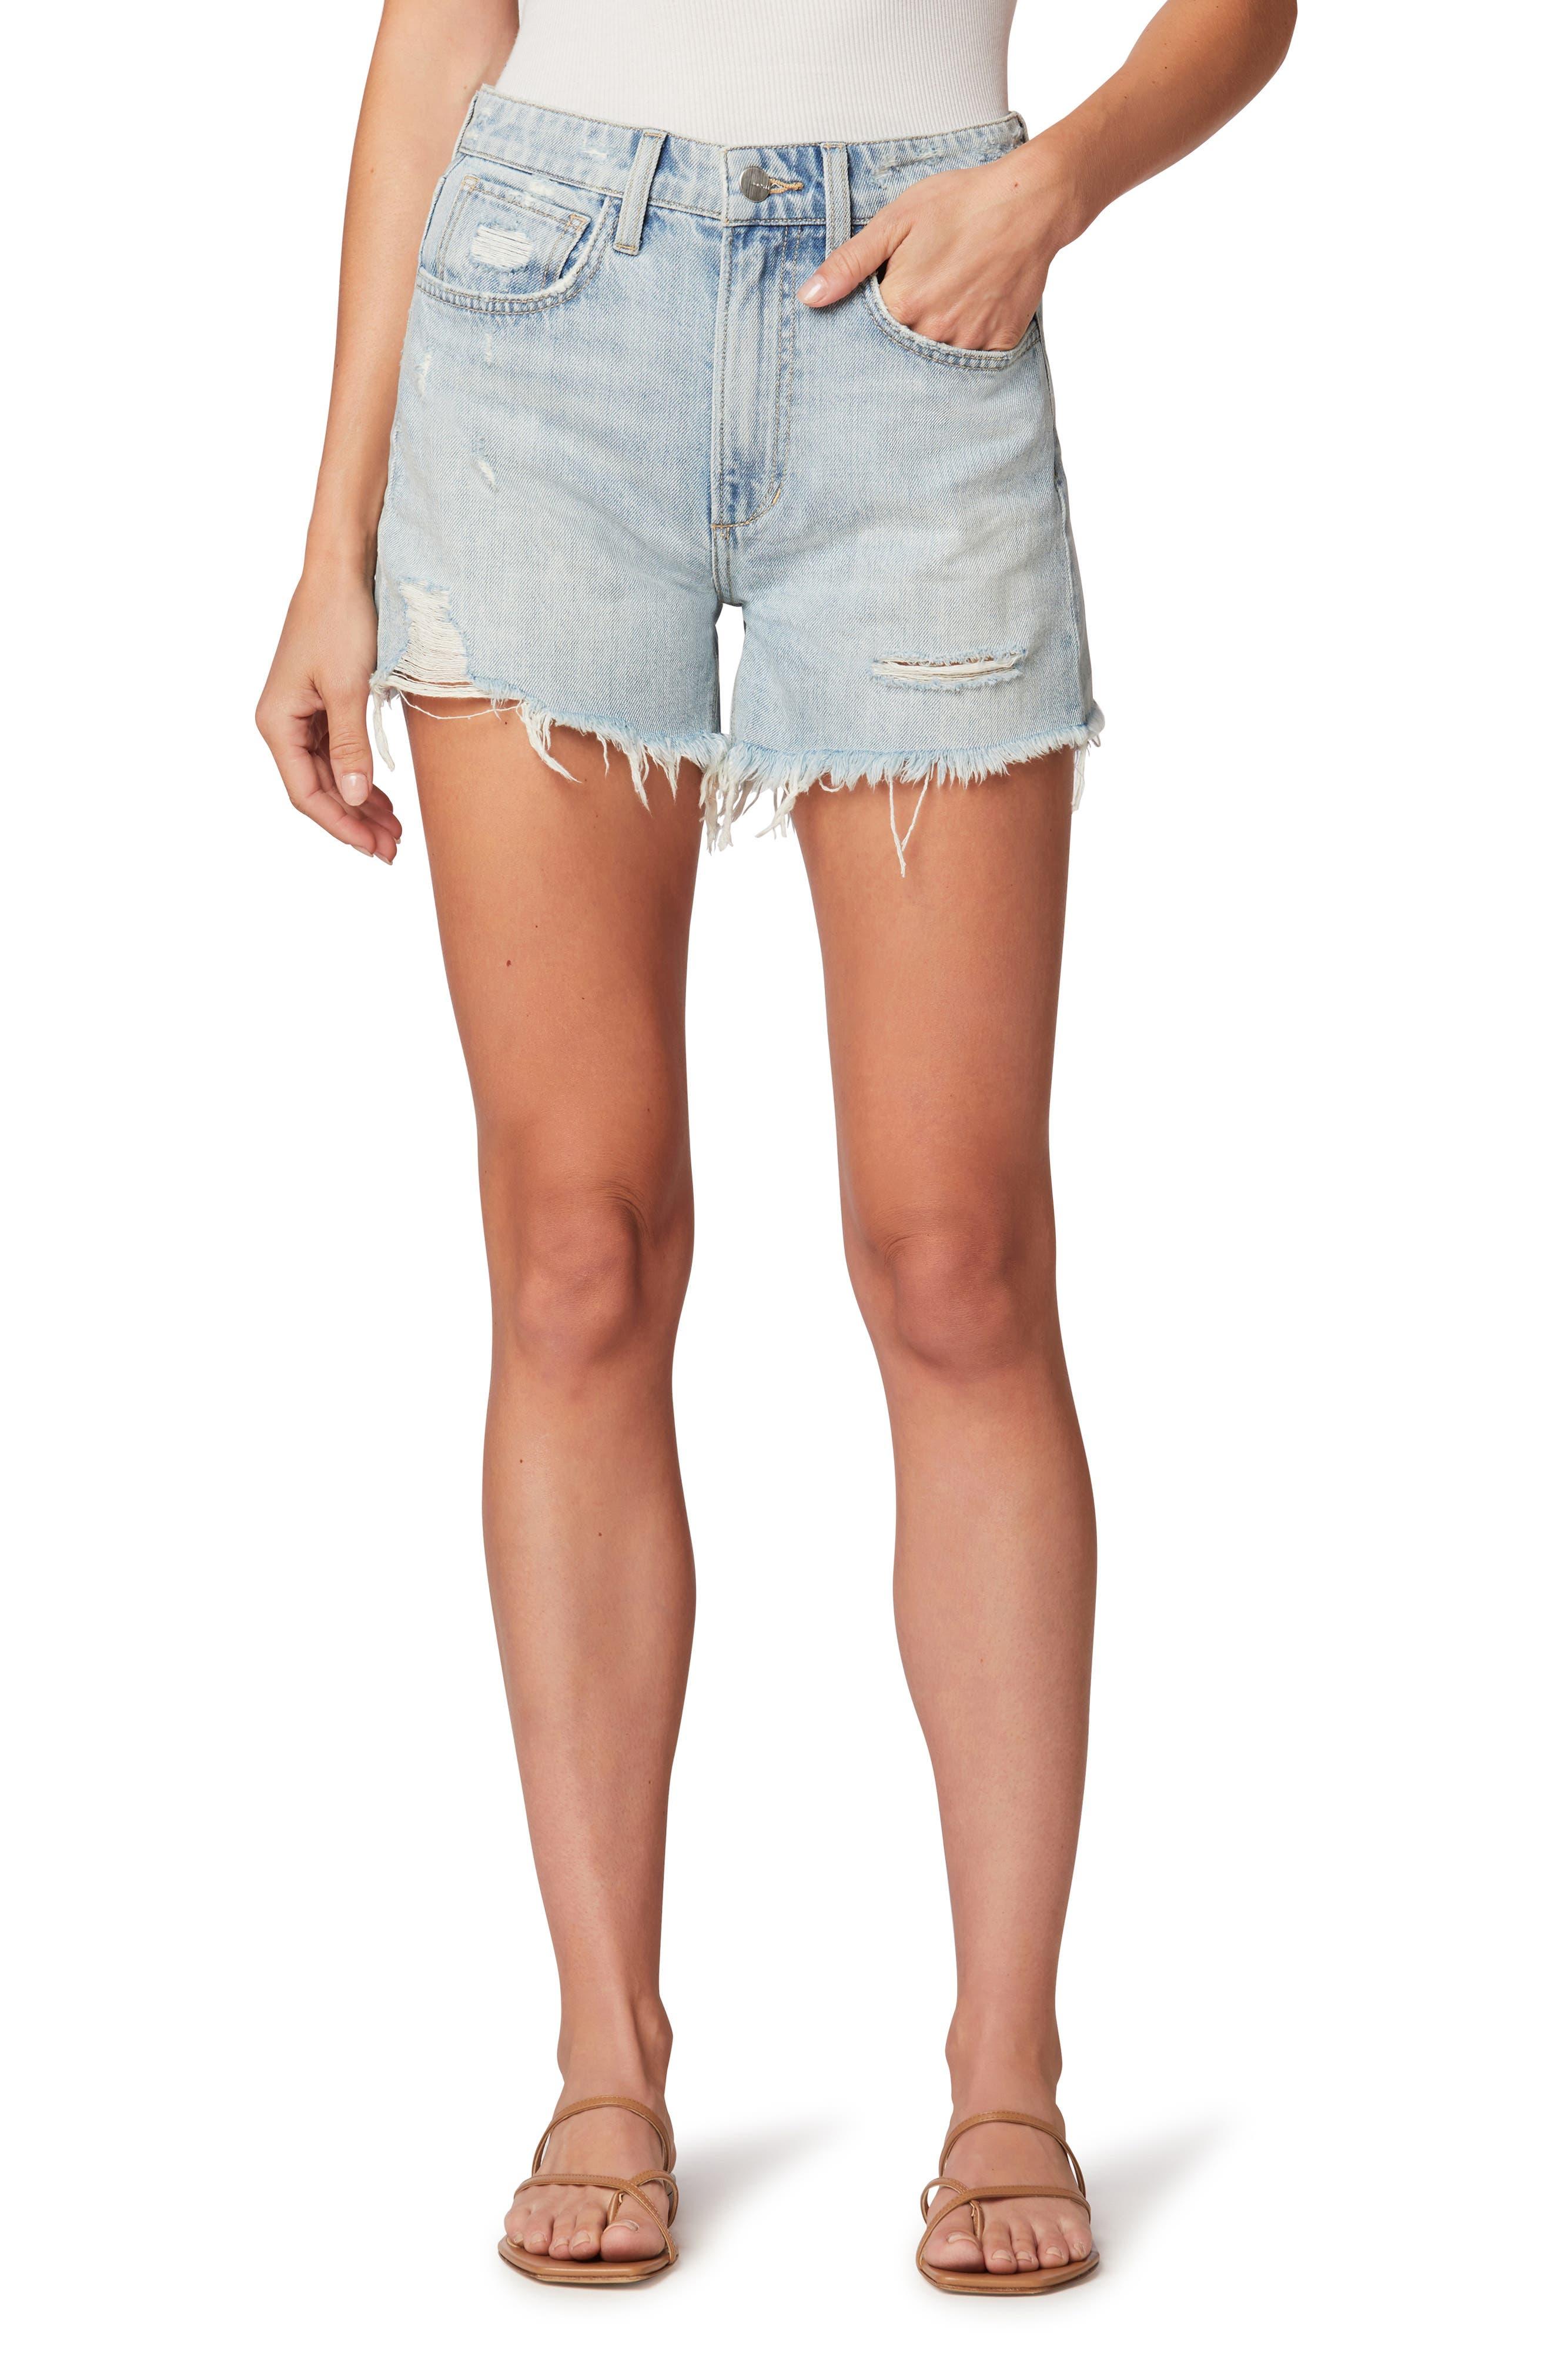 The Sadie Distressed High Waist Denim Shorts